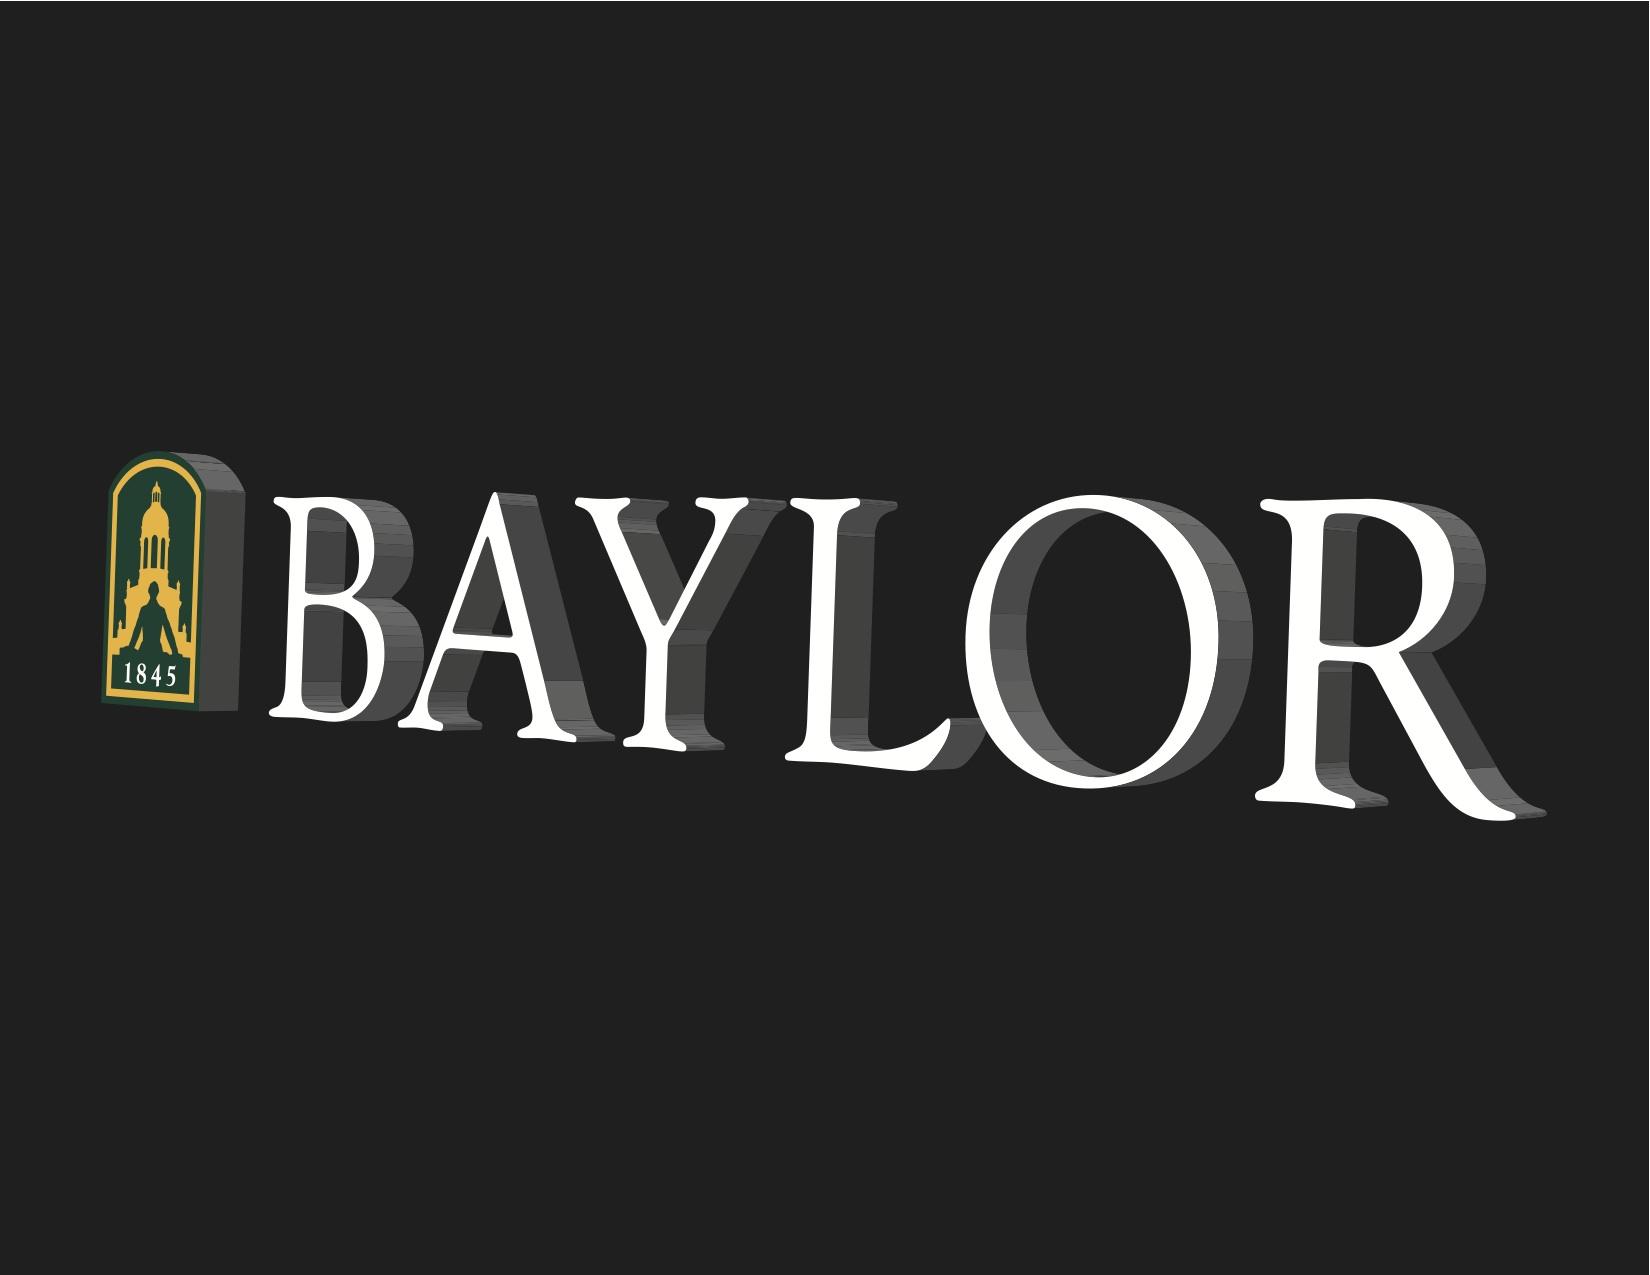 Baylor University Logo Wallpaper wwwimgkidcom   The 1650x1275